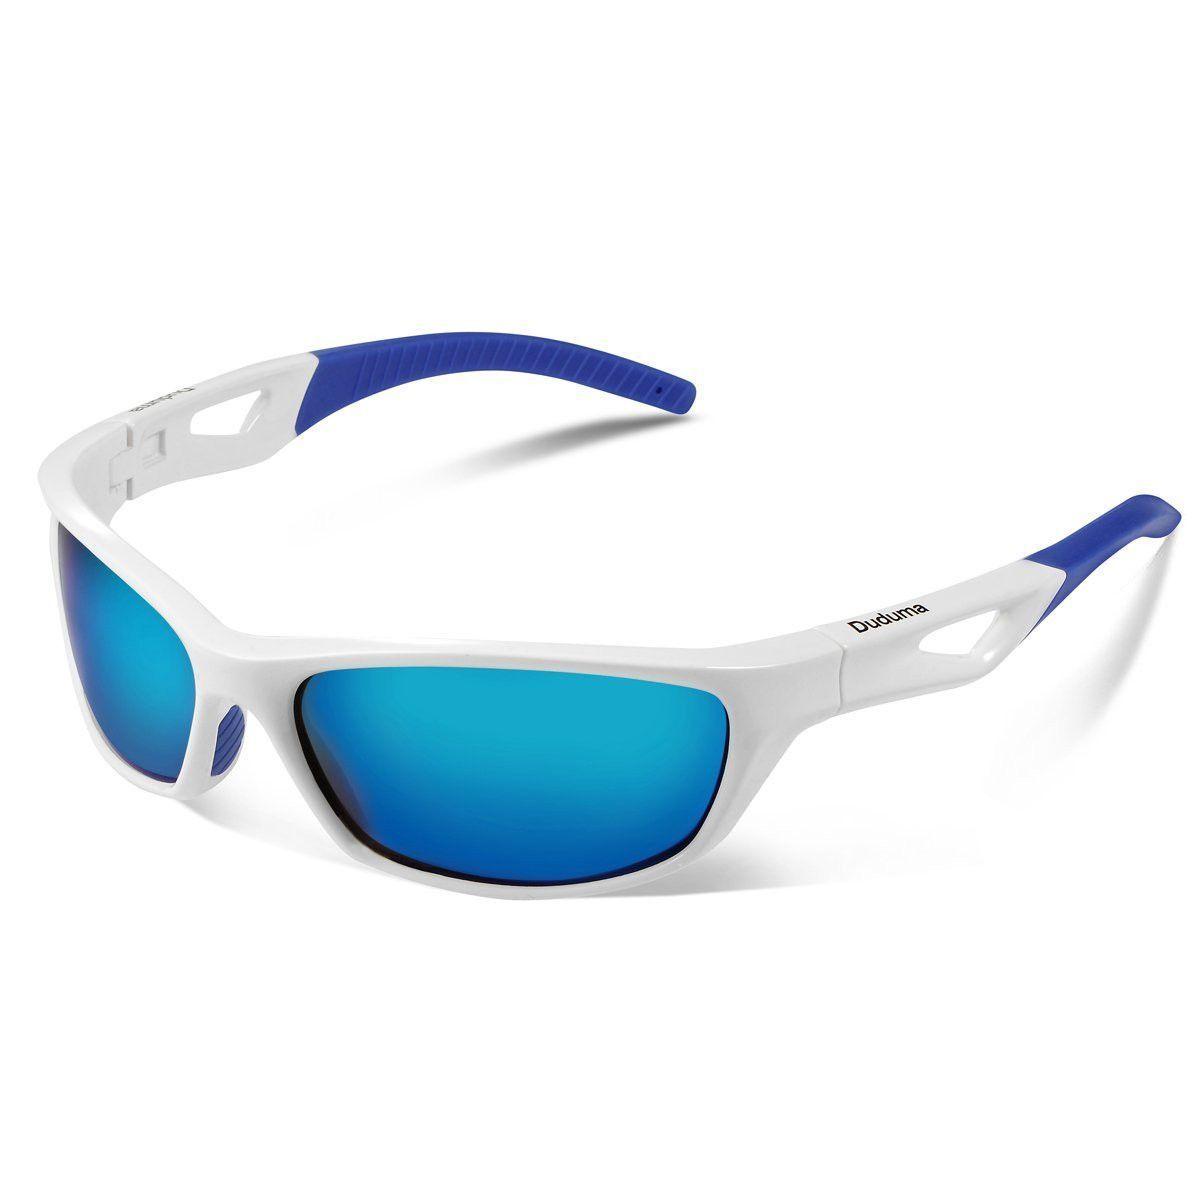 c2154c482a Duduma Polarized Sports Sunglasses for Mens Womens Baseball Fishing Golf  Running Cycling Driving Softball Hiking Floating Unbreakable Shades Tr80821